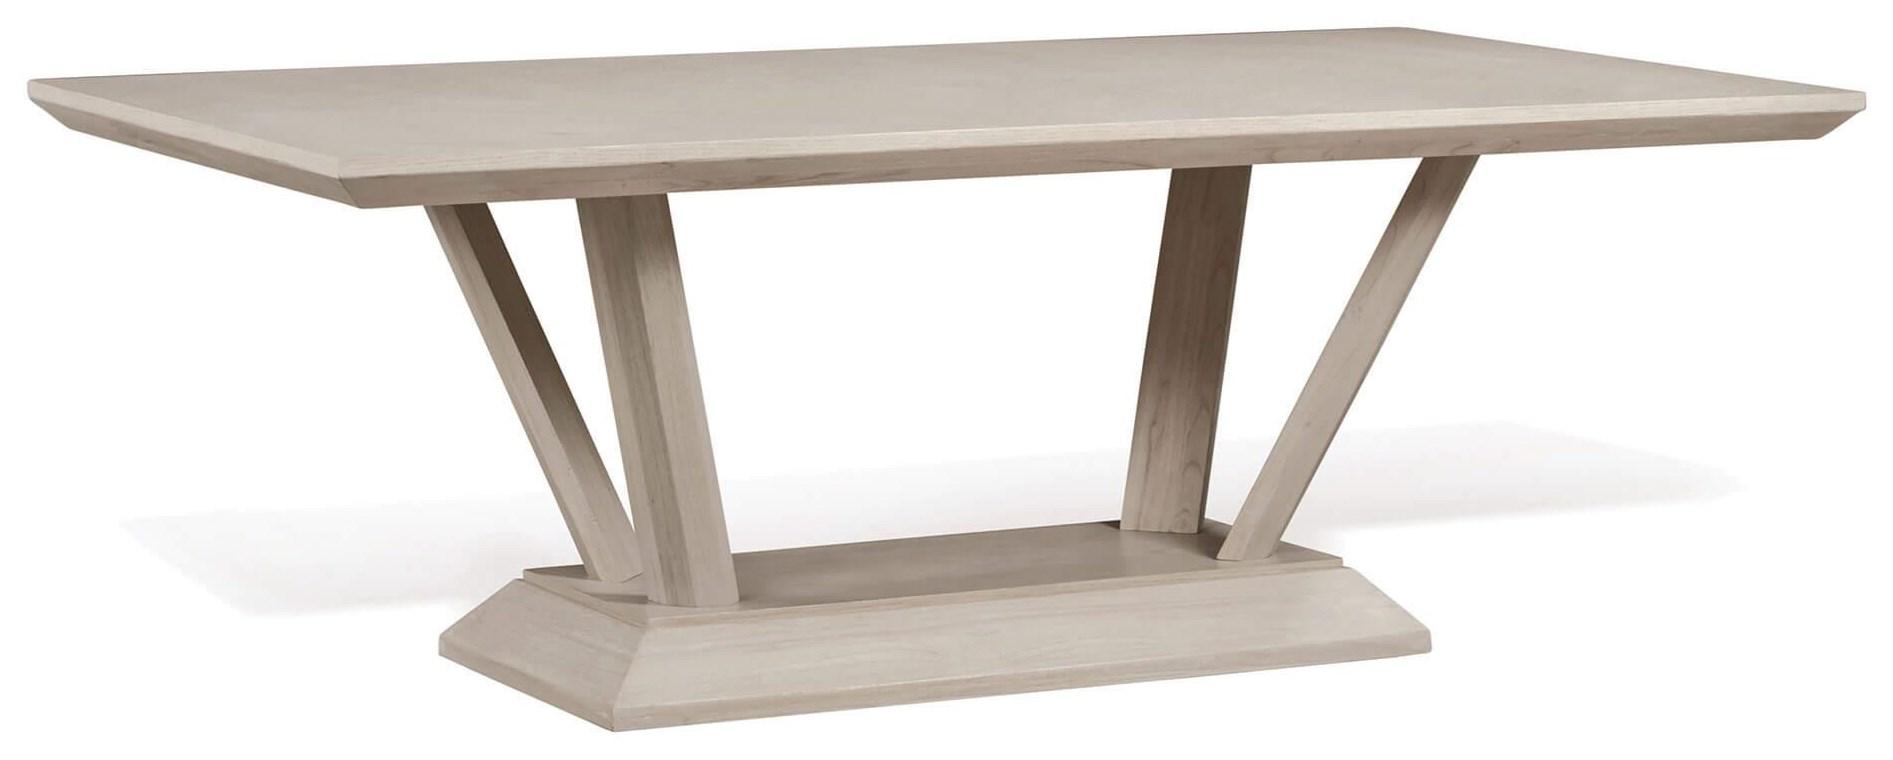 Sarah Richardson Vista Vista Rect.dining Table by Palliser at Stoney Creek Furniture